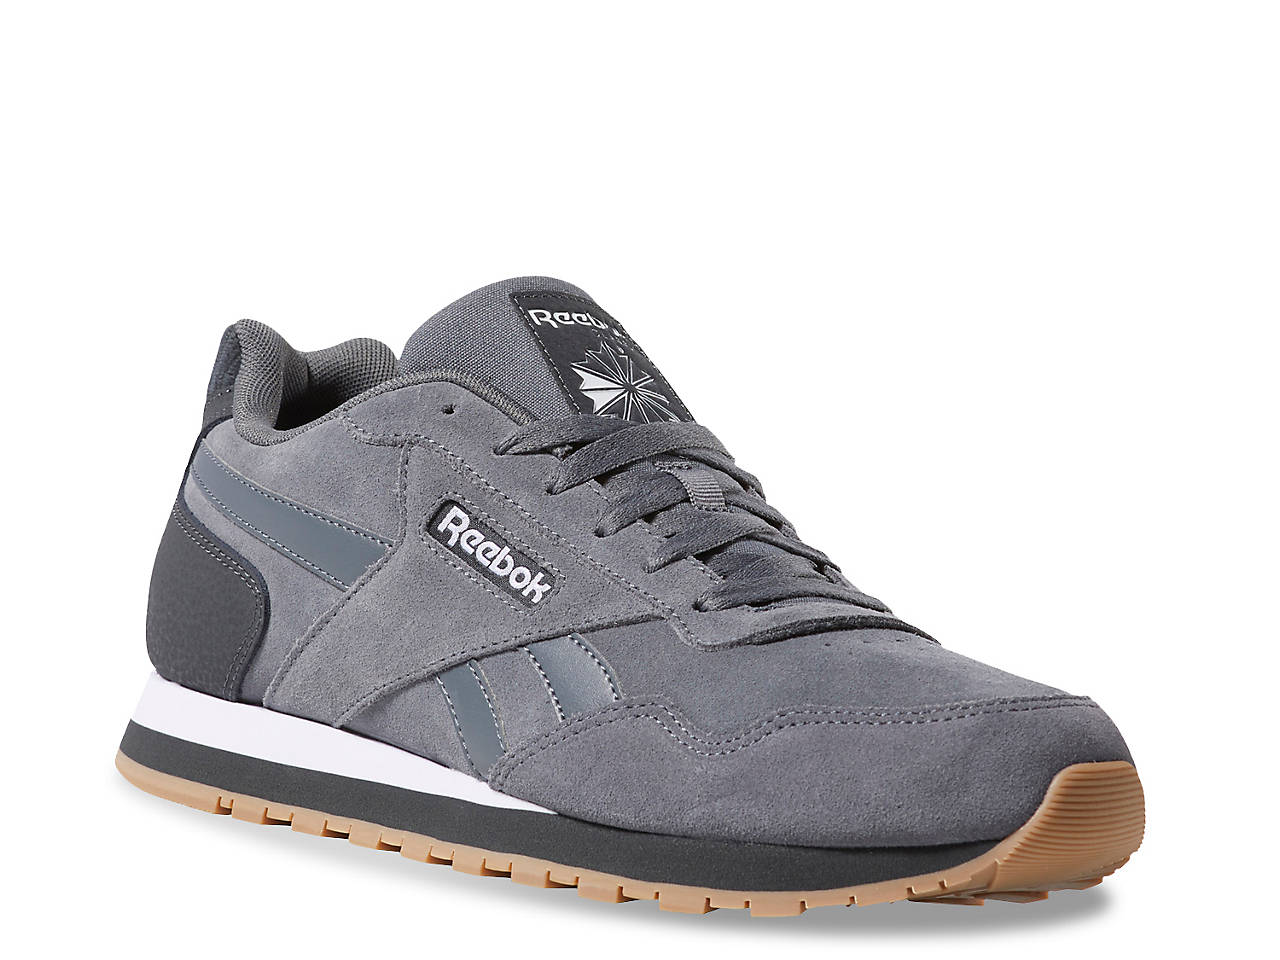 d1069c19e1c0f Reebok Classic Harman Run Sneaker - Men s Men s Shoes